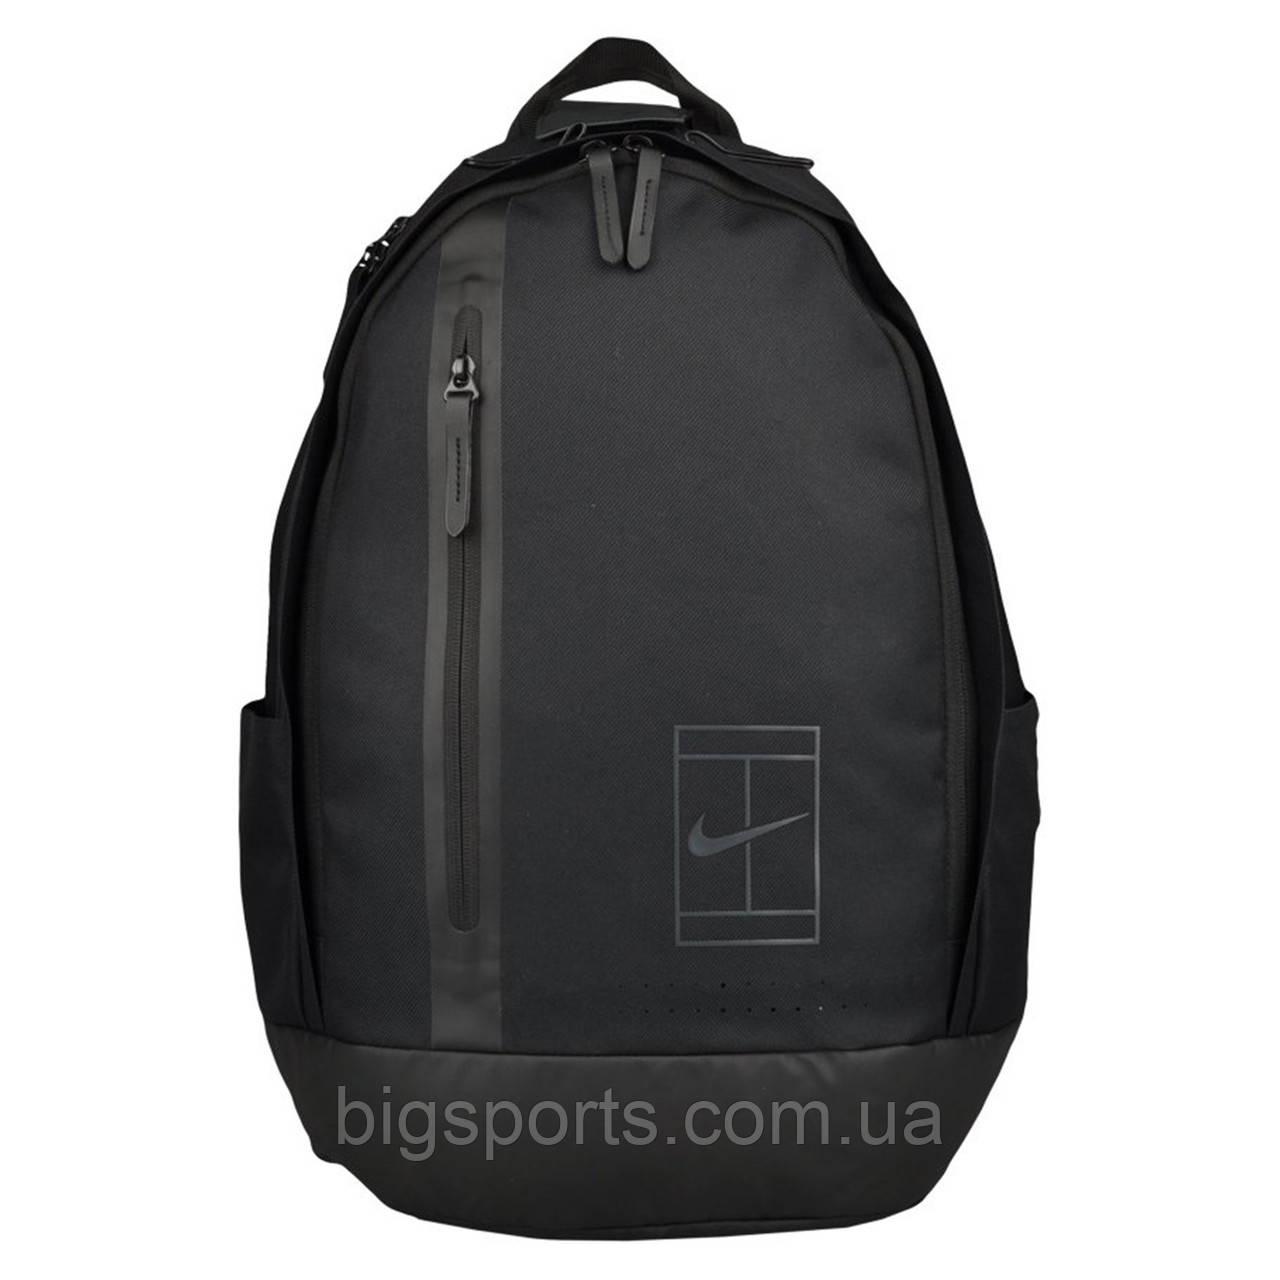 Рюкзак спортивный Nike Nkcrt Advantage Bkpk (арт. BA5450-010)